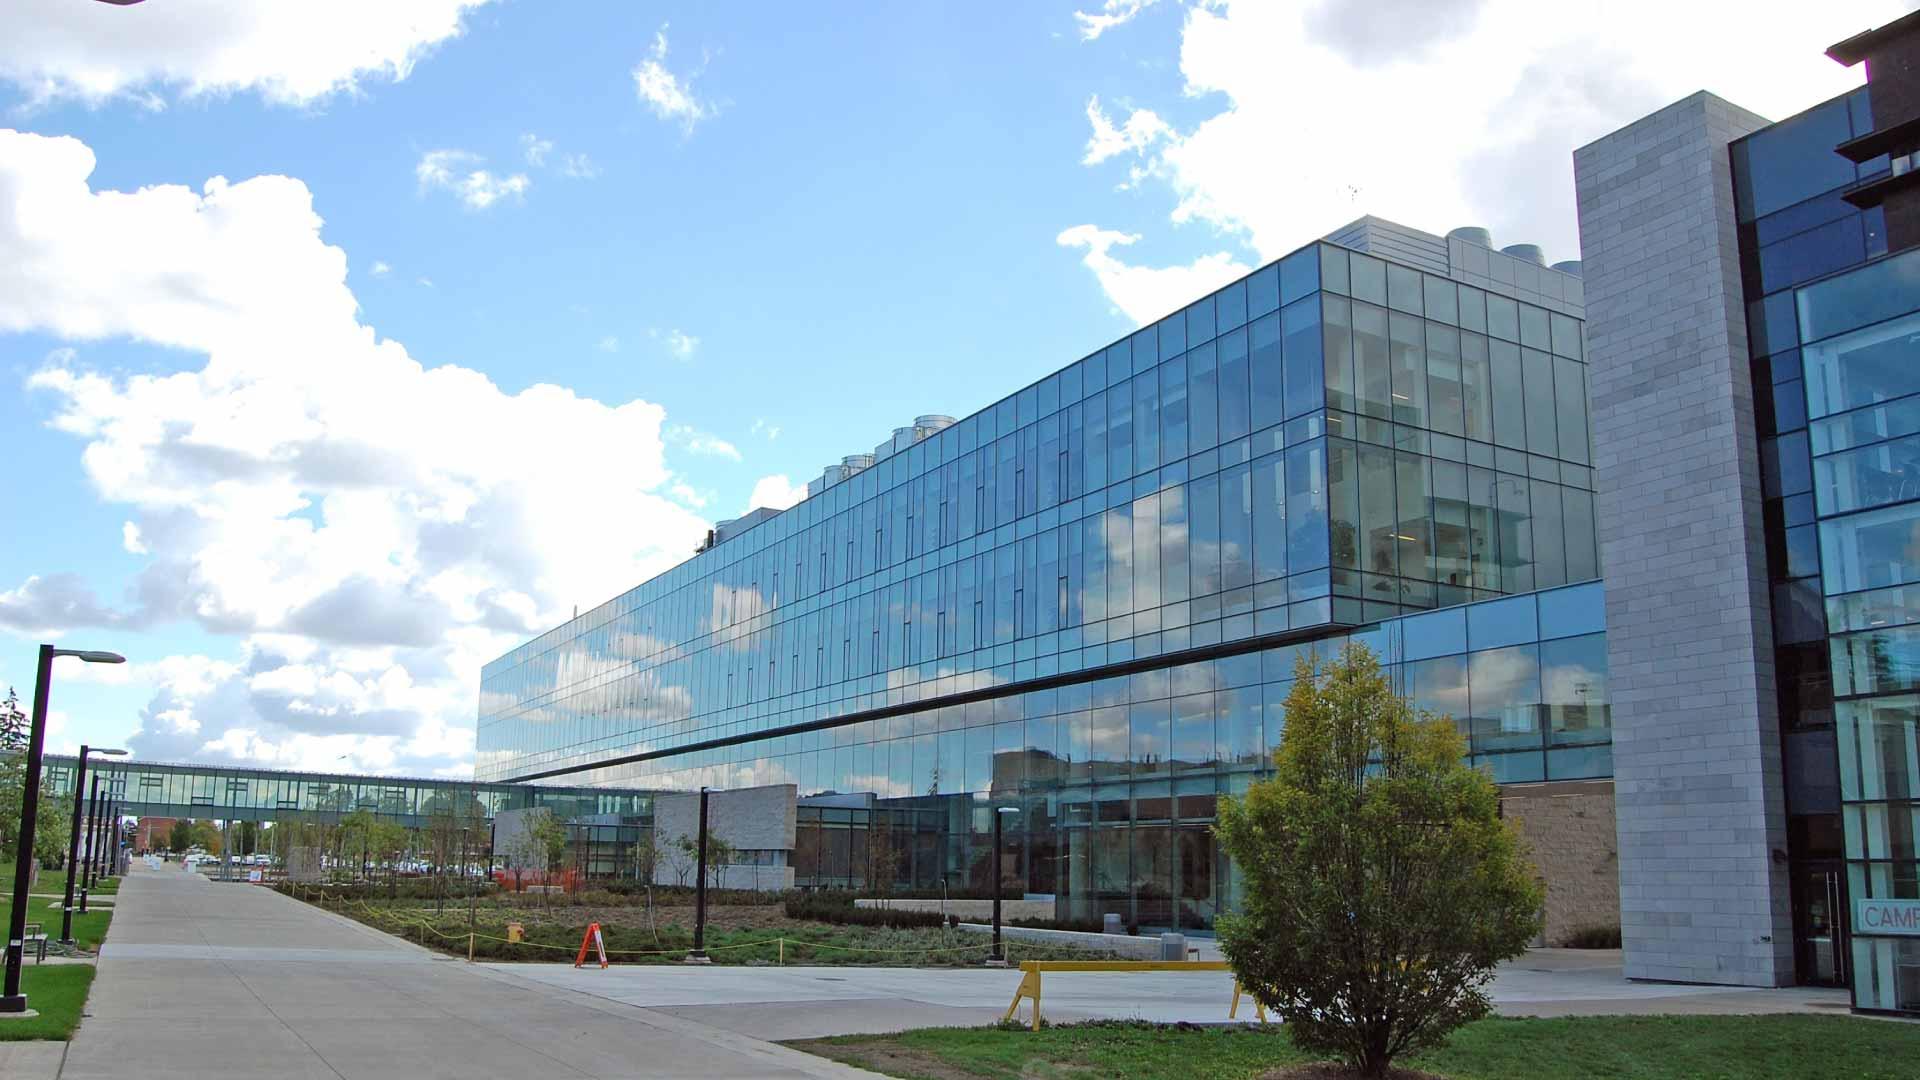 Glass building on Brock University campus